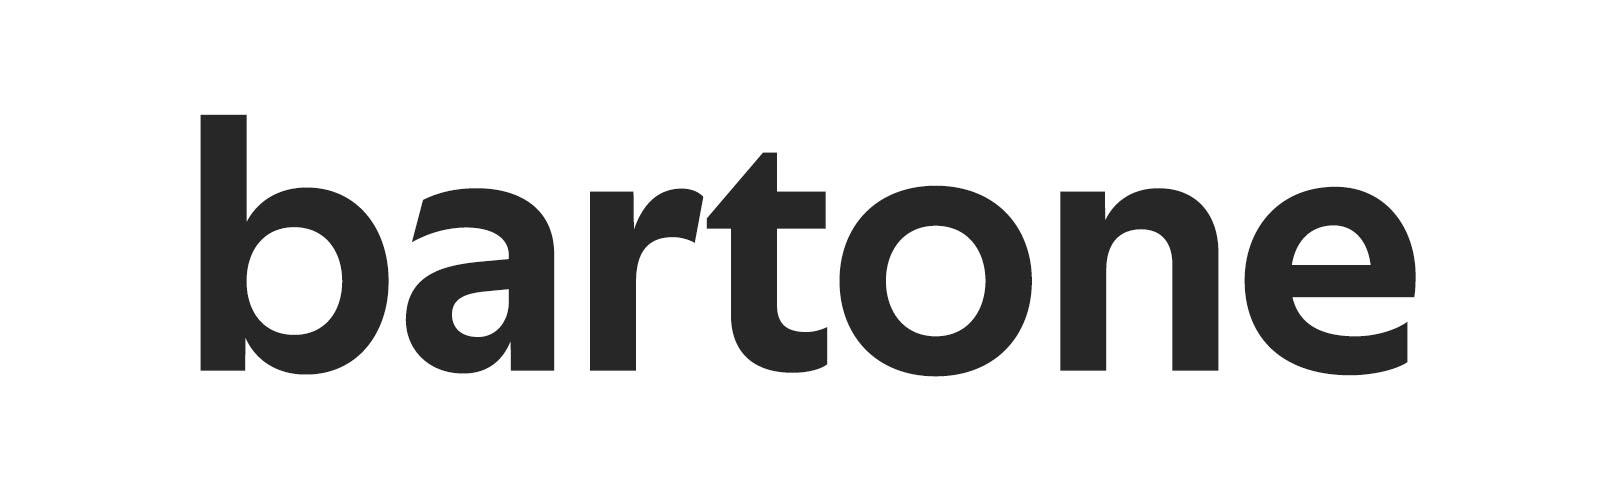 BARTONE MARTECH